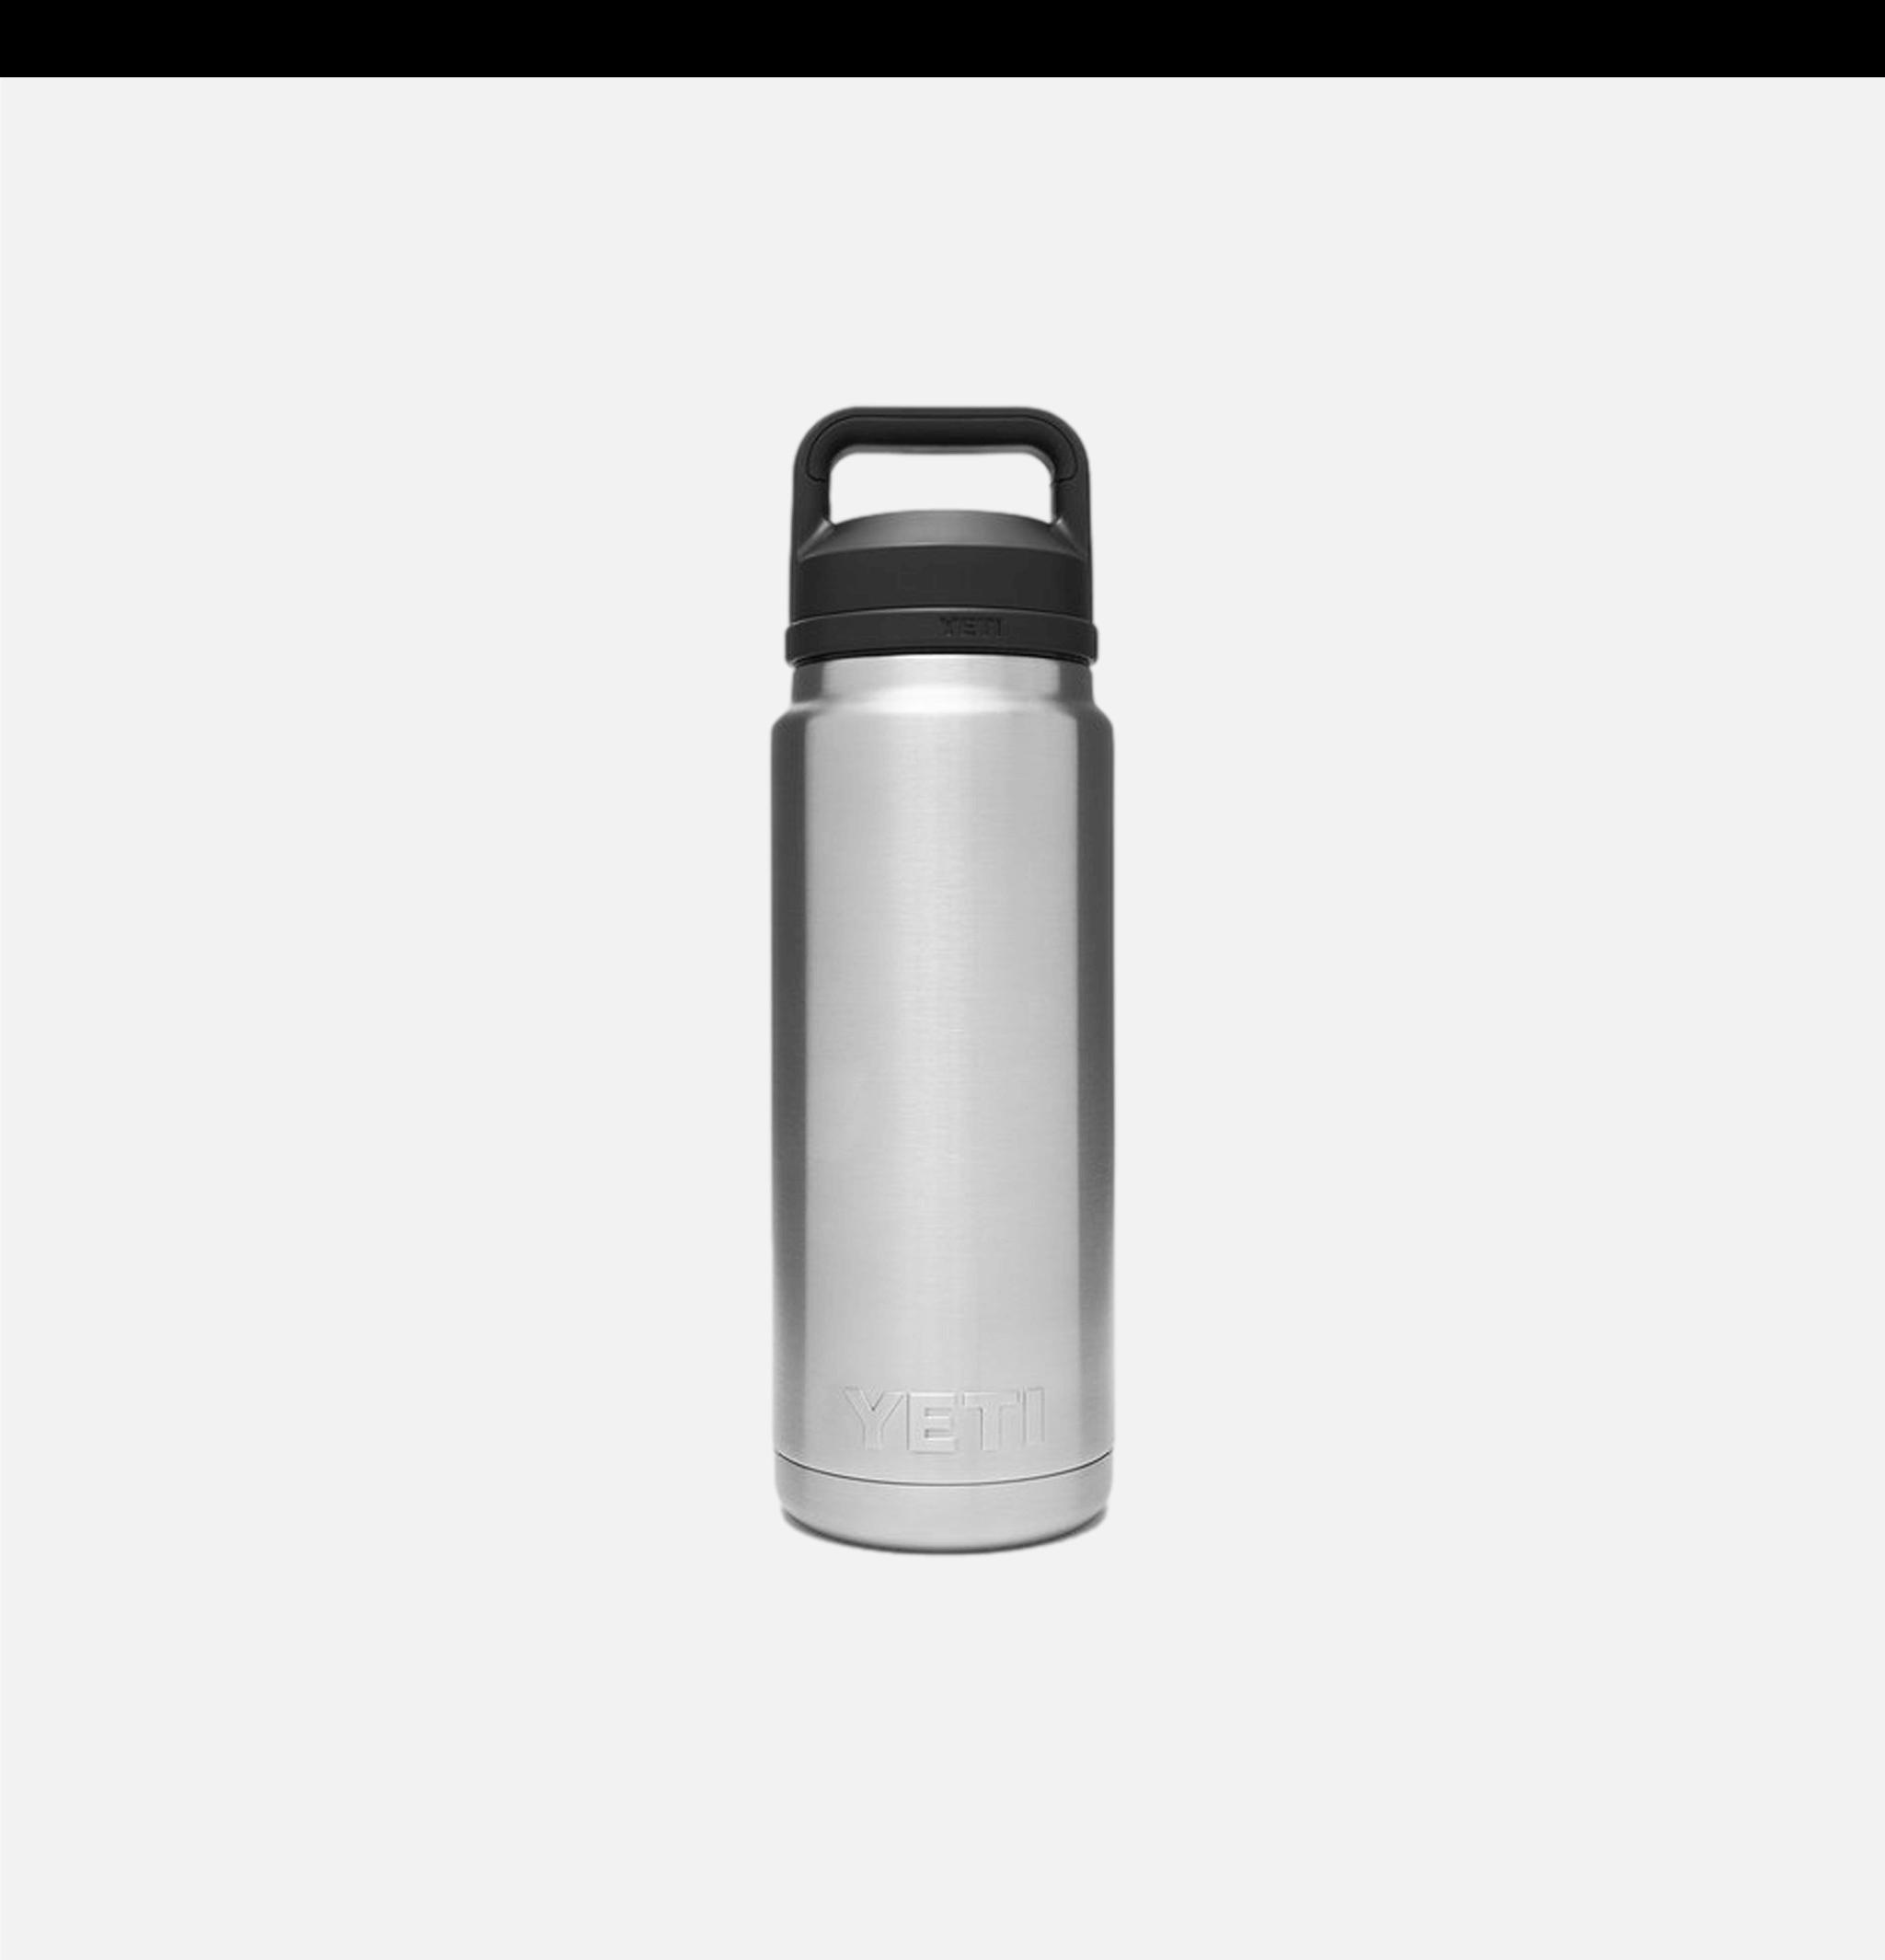 Rambler Bottle Chug 26oz Steel